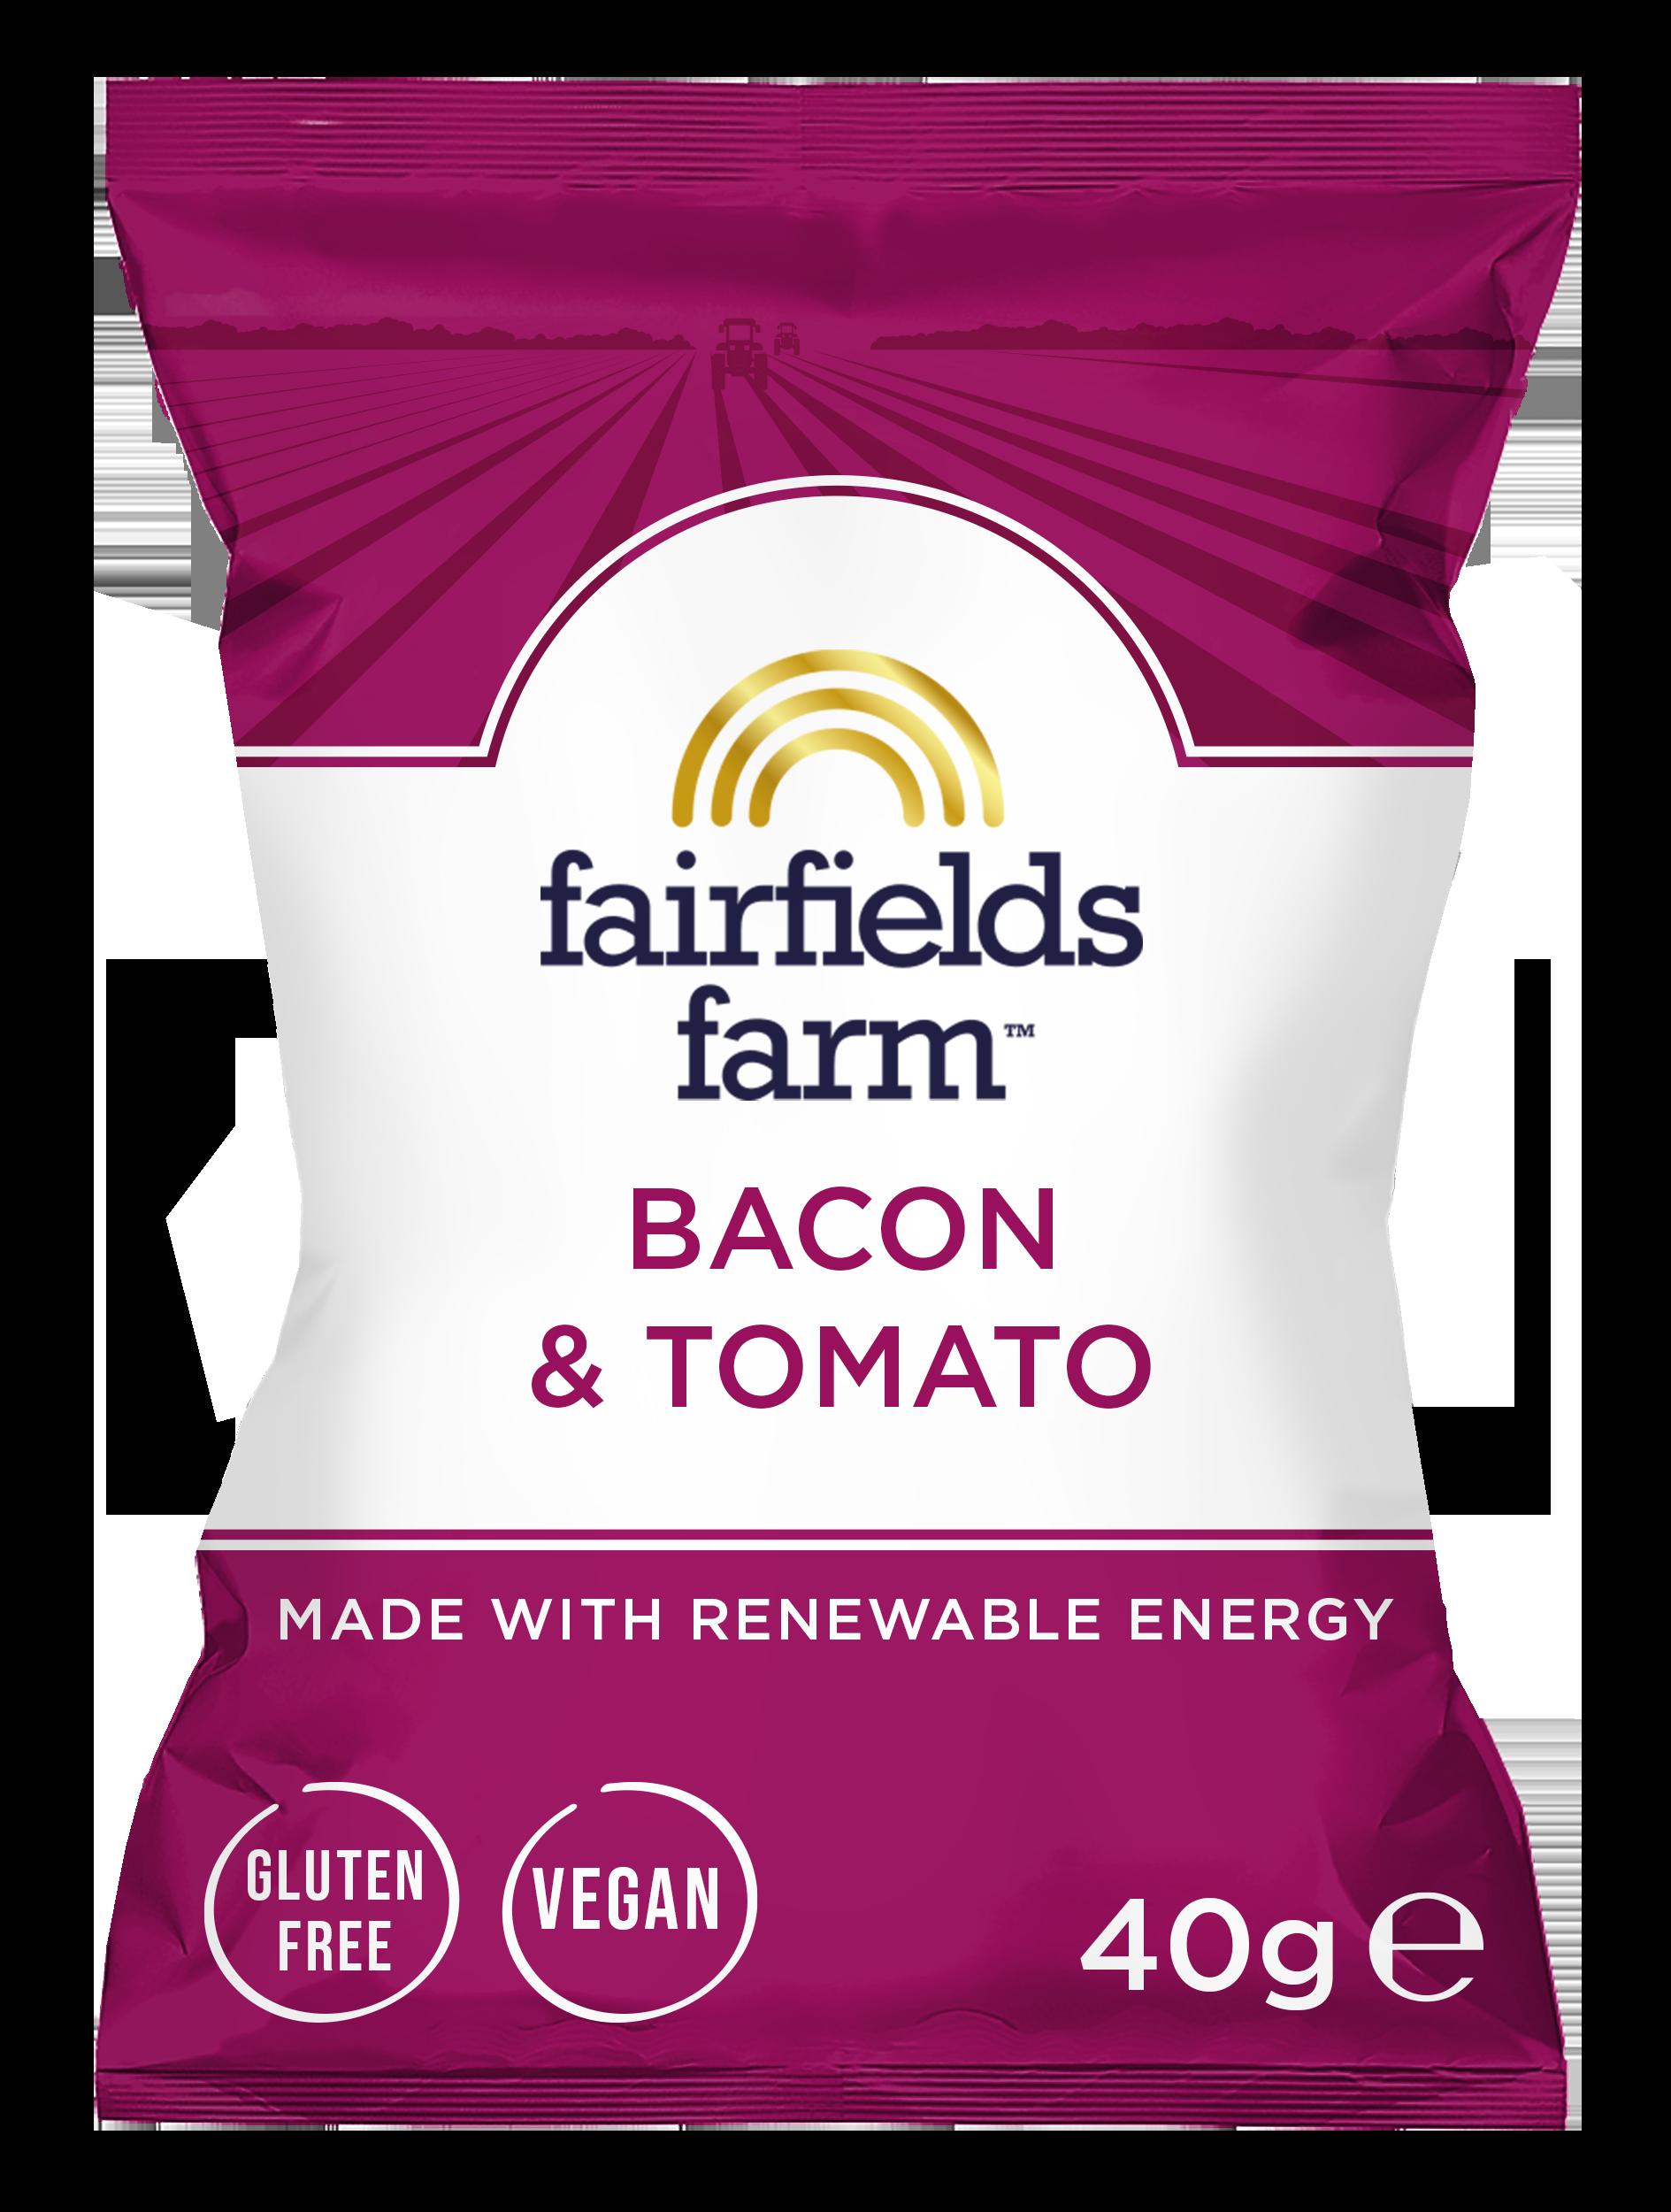 Fairfields 24 x 40g Bags – Bacon & Tomato